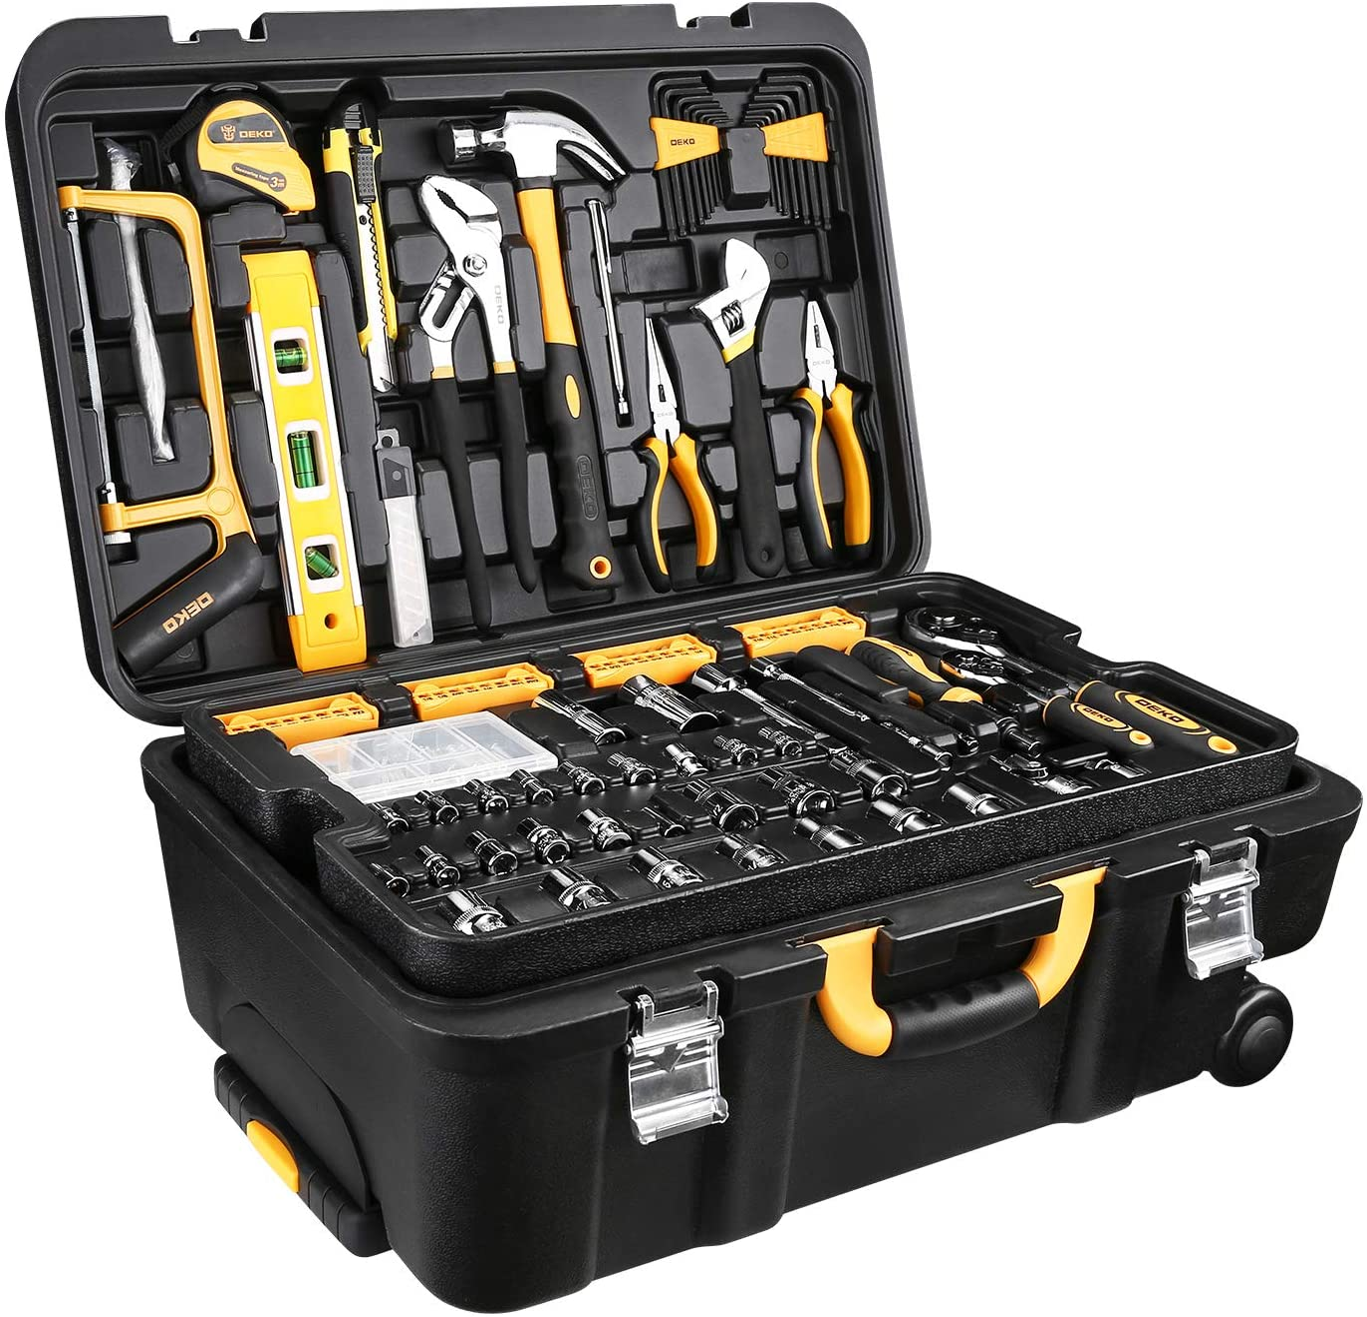 DEKO 258 Piece Tool Kit with Rolling Tool Box Mechanic Case Trolley Portable